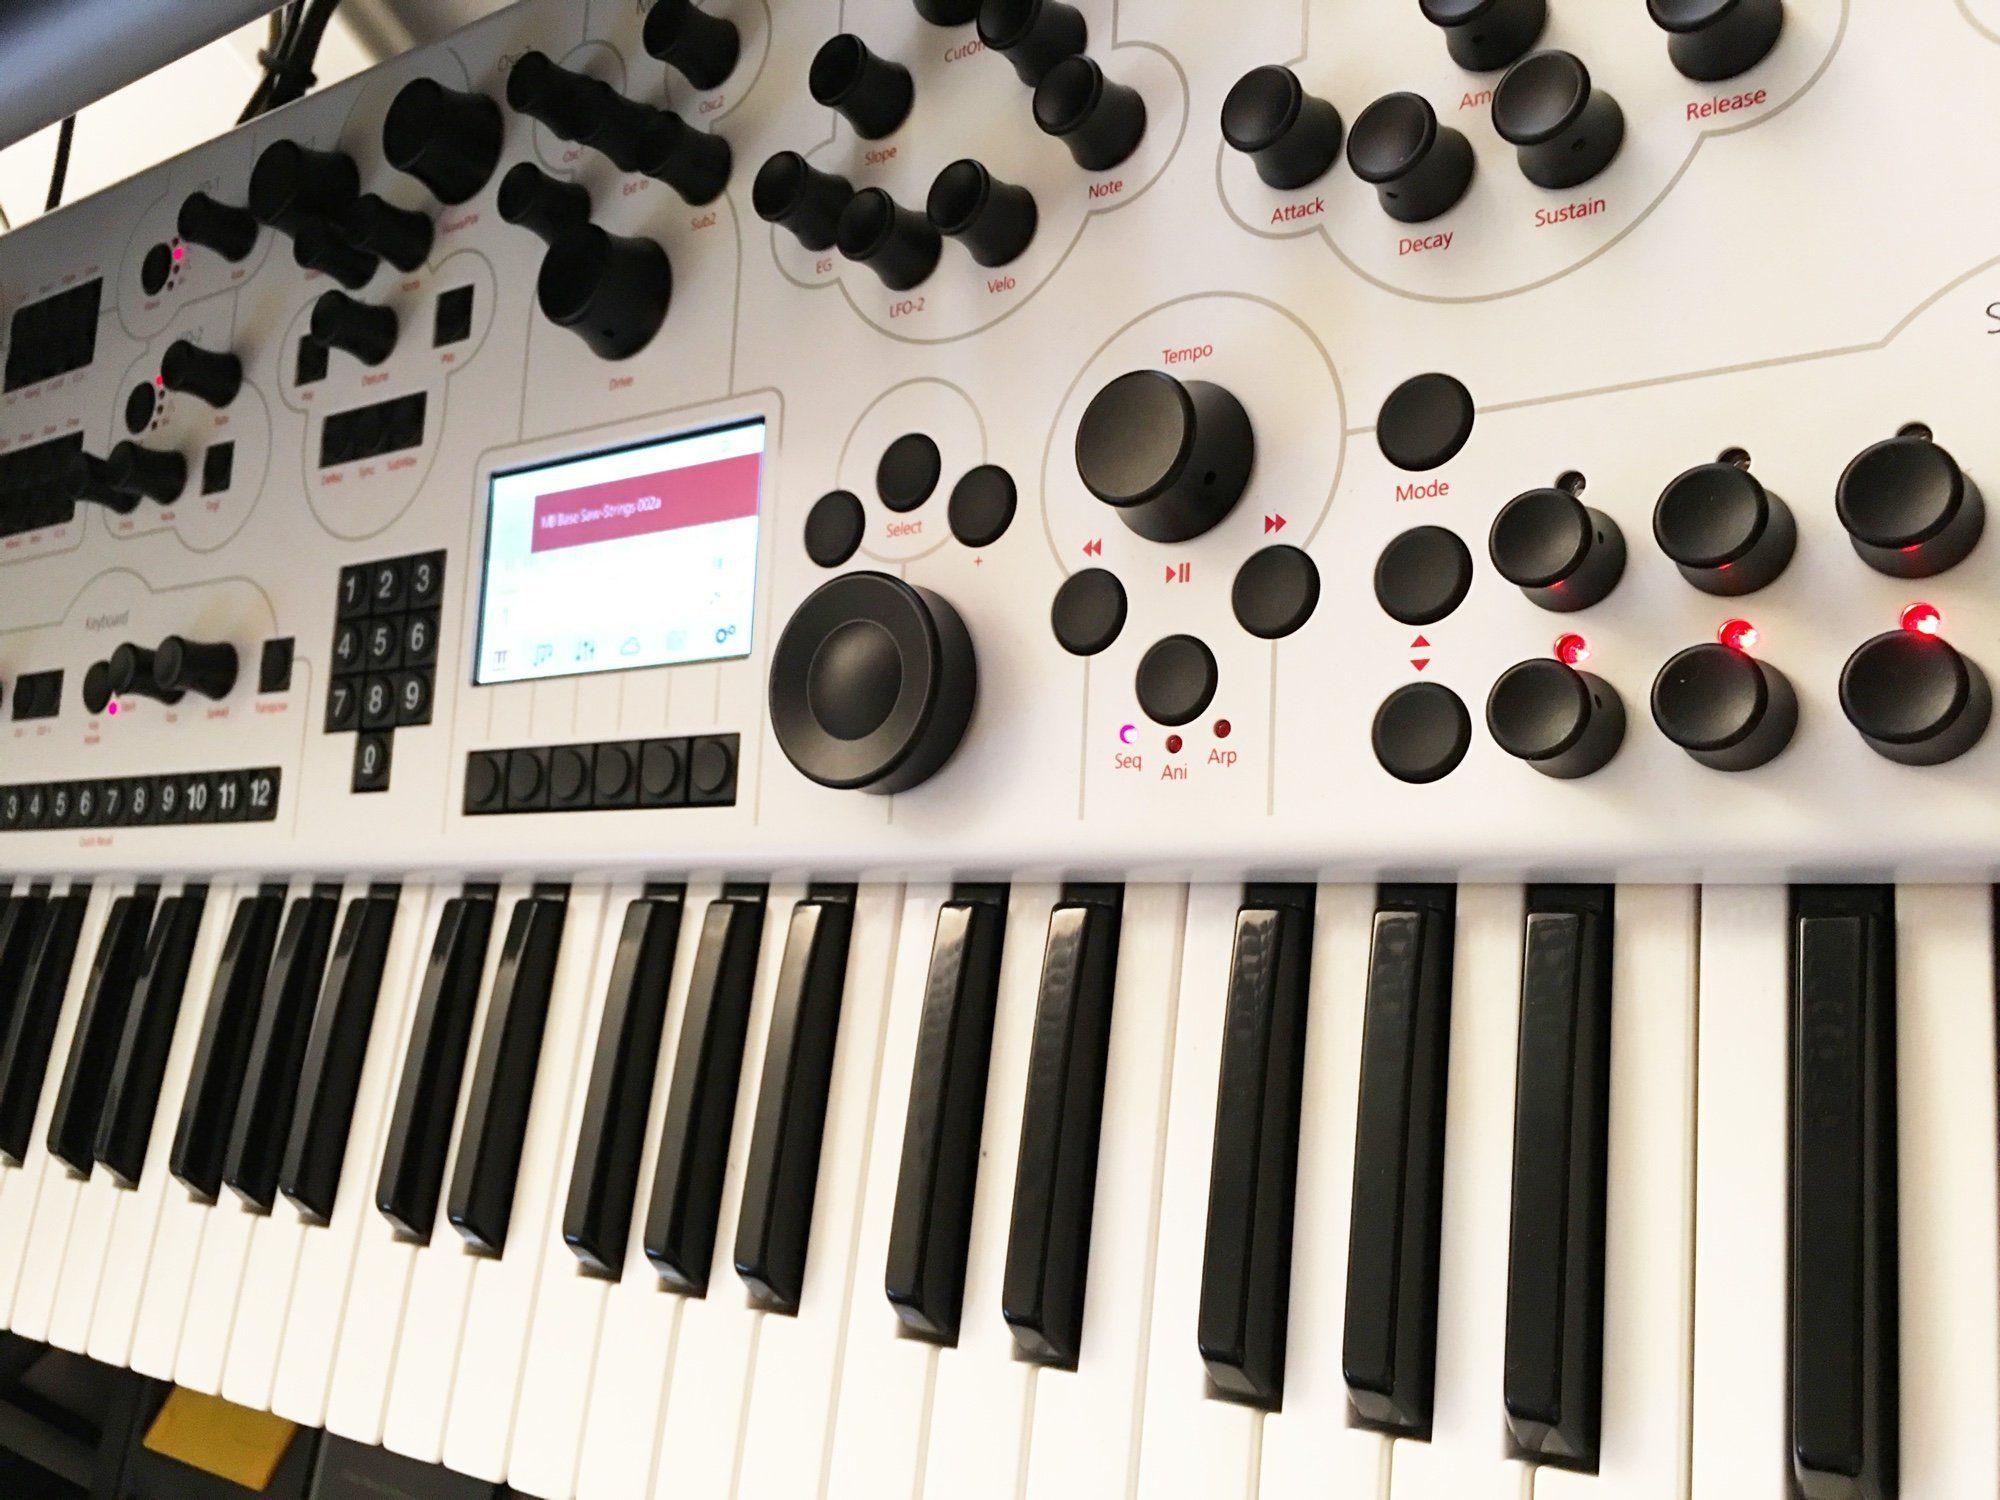 test modal electronics 002 hybrid synthesizer. Black Bedroom Furniture Sets. Home Design Ideas